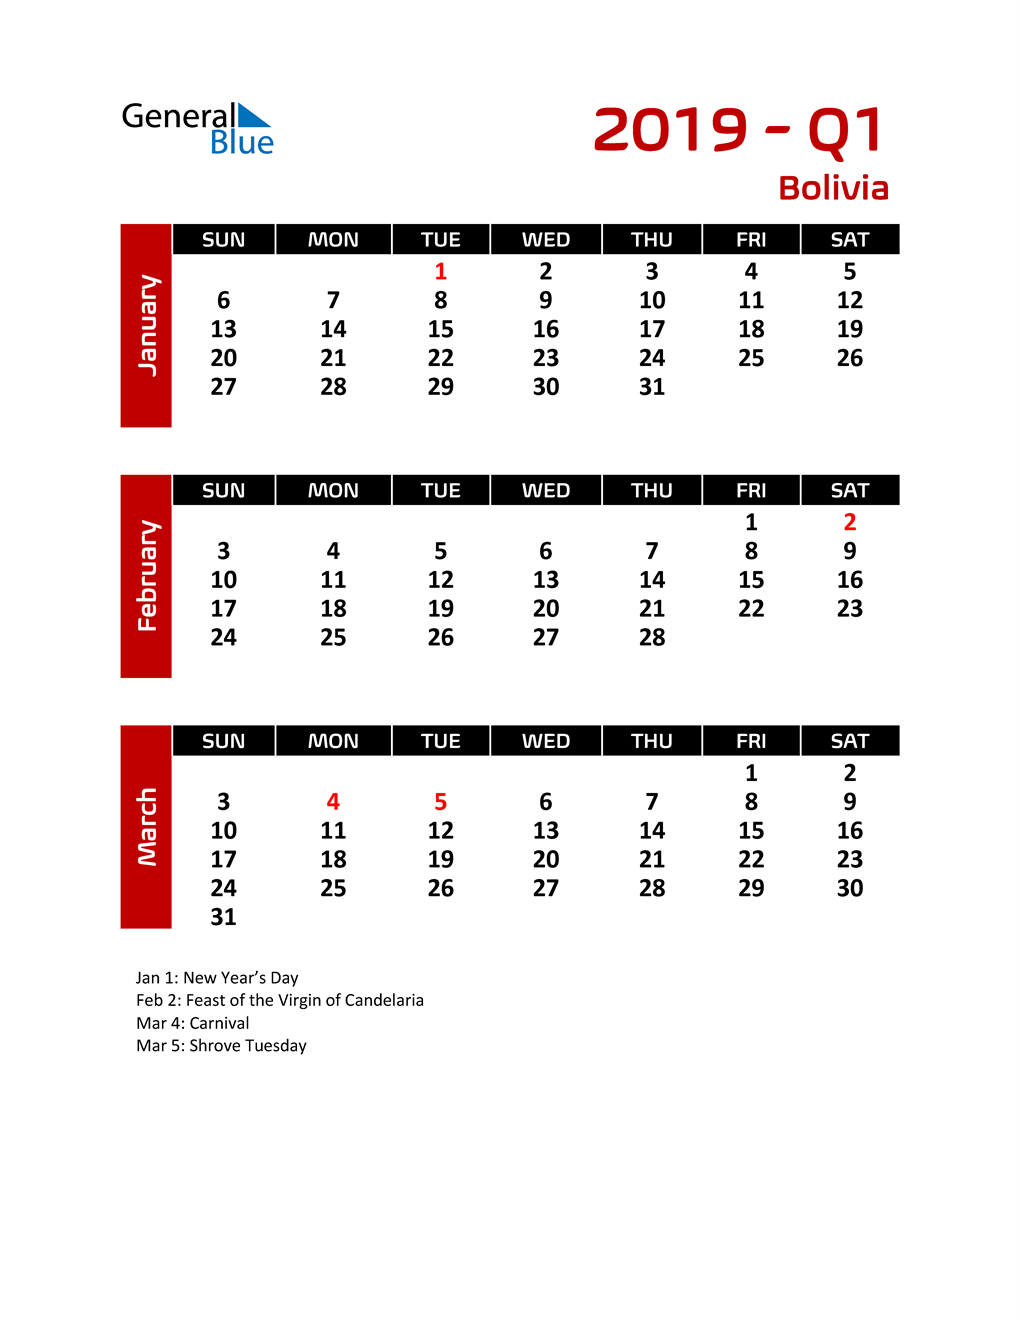 Q1 2019 Calendar with Holidays